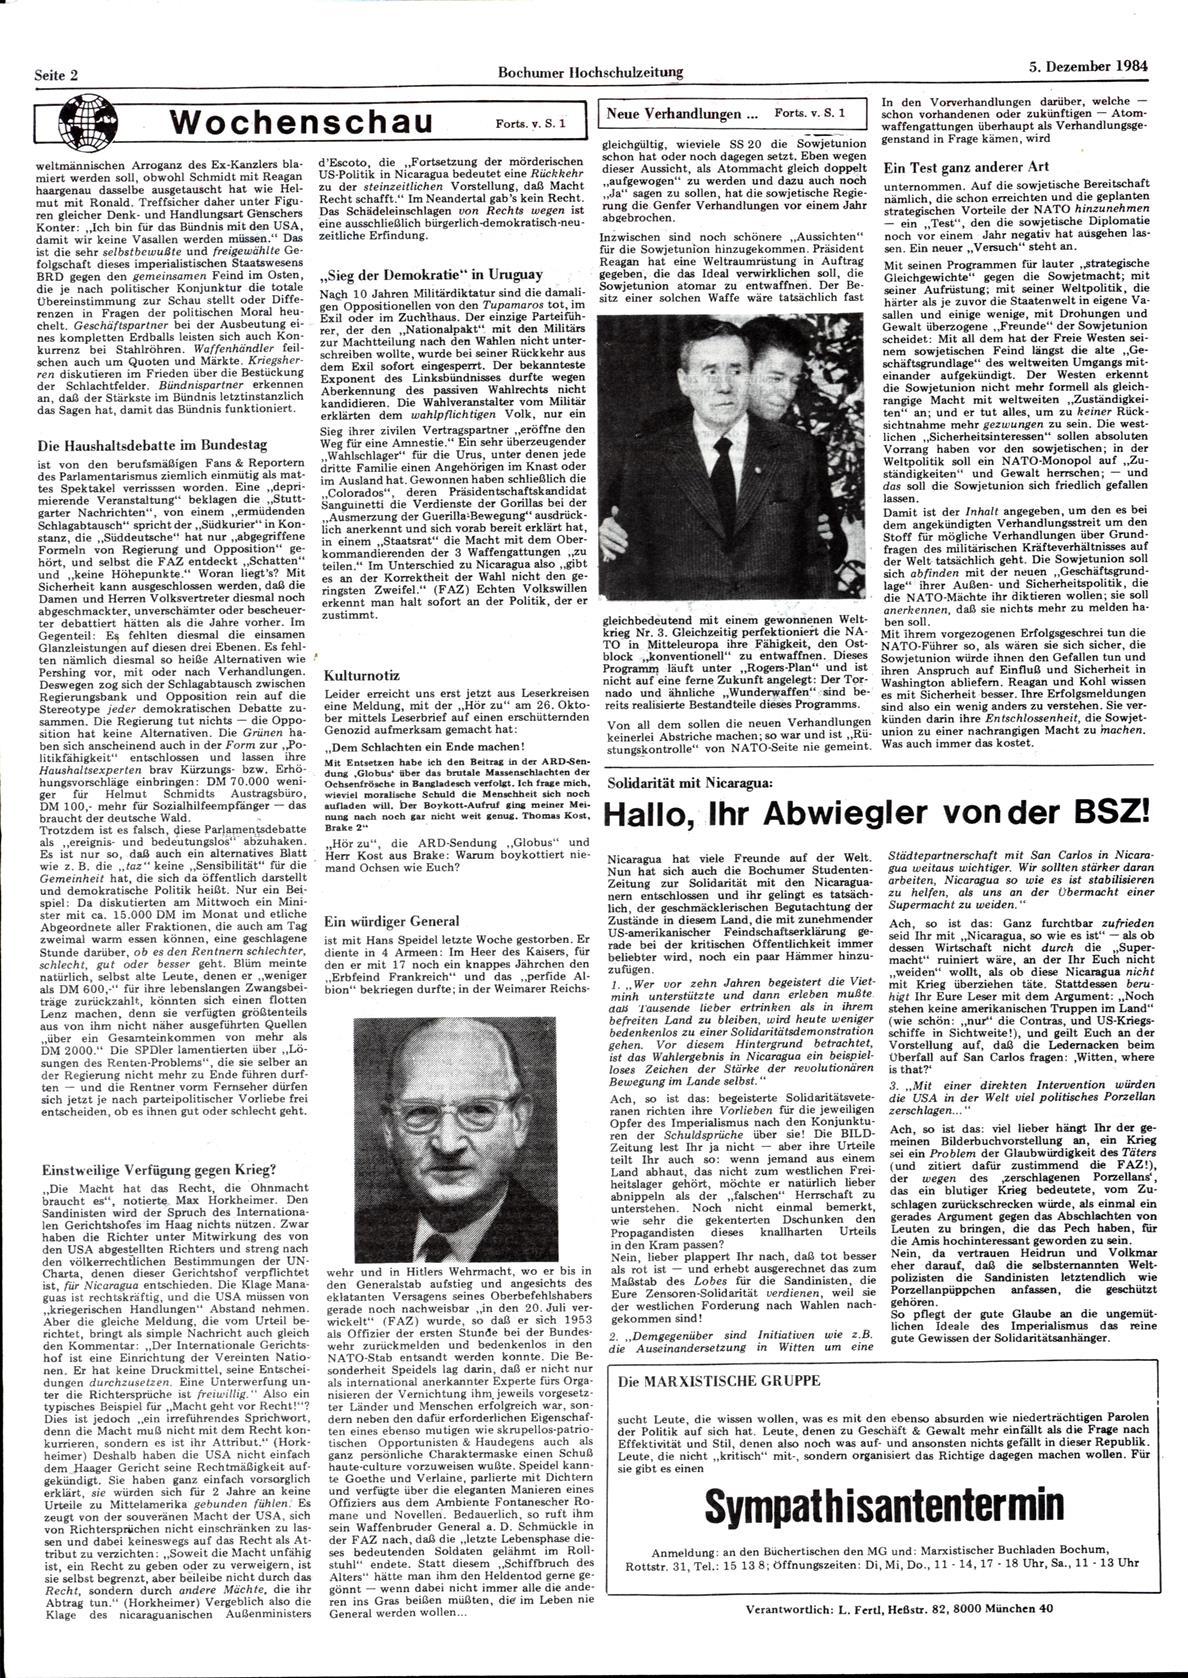 Bochum_BHZ_19841205_102_002